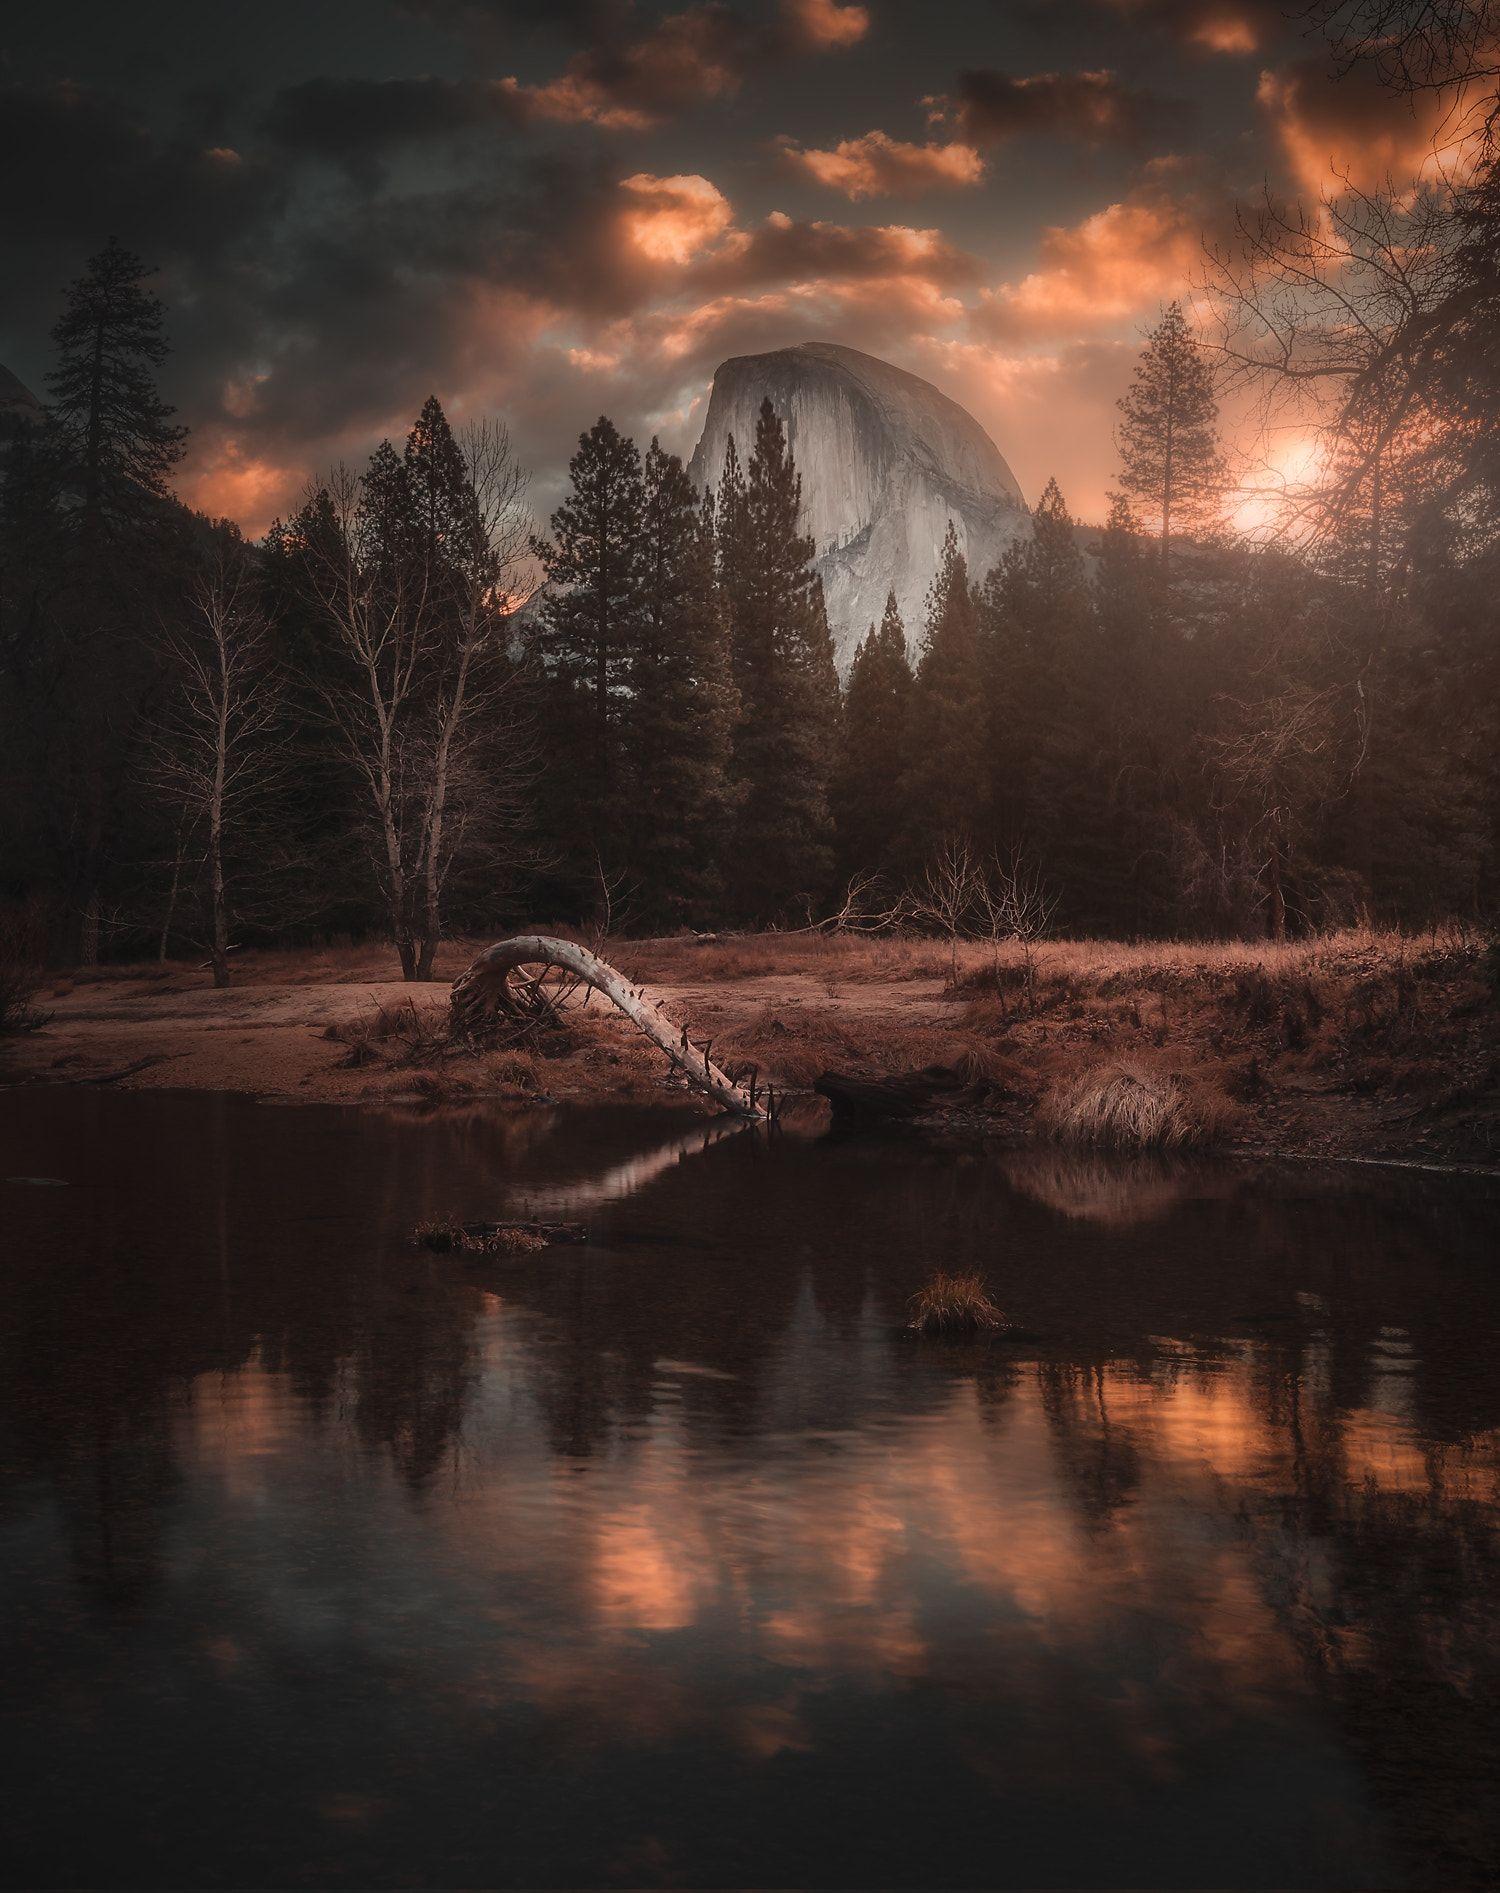 My Happy Place Amazing Weekend At Yosemite National Park Nikon D850 Nikon 16 35mm Instagram Com Rsphotolog Happy Places My Happy Place Nature